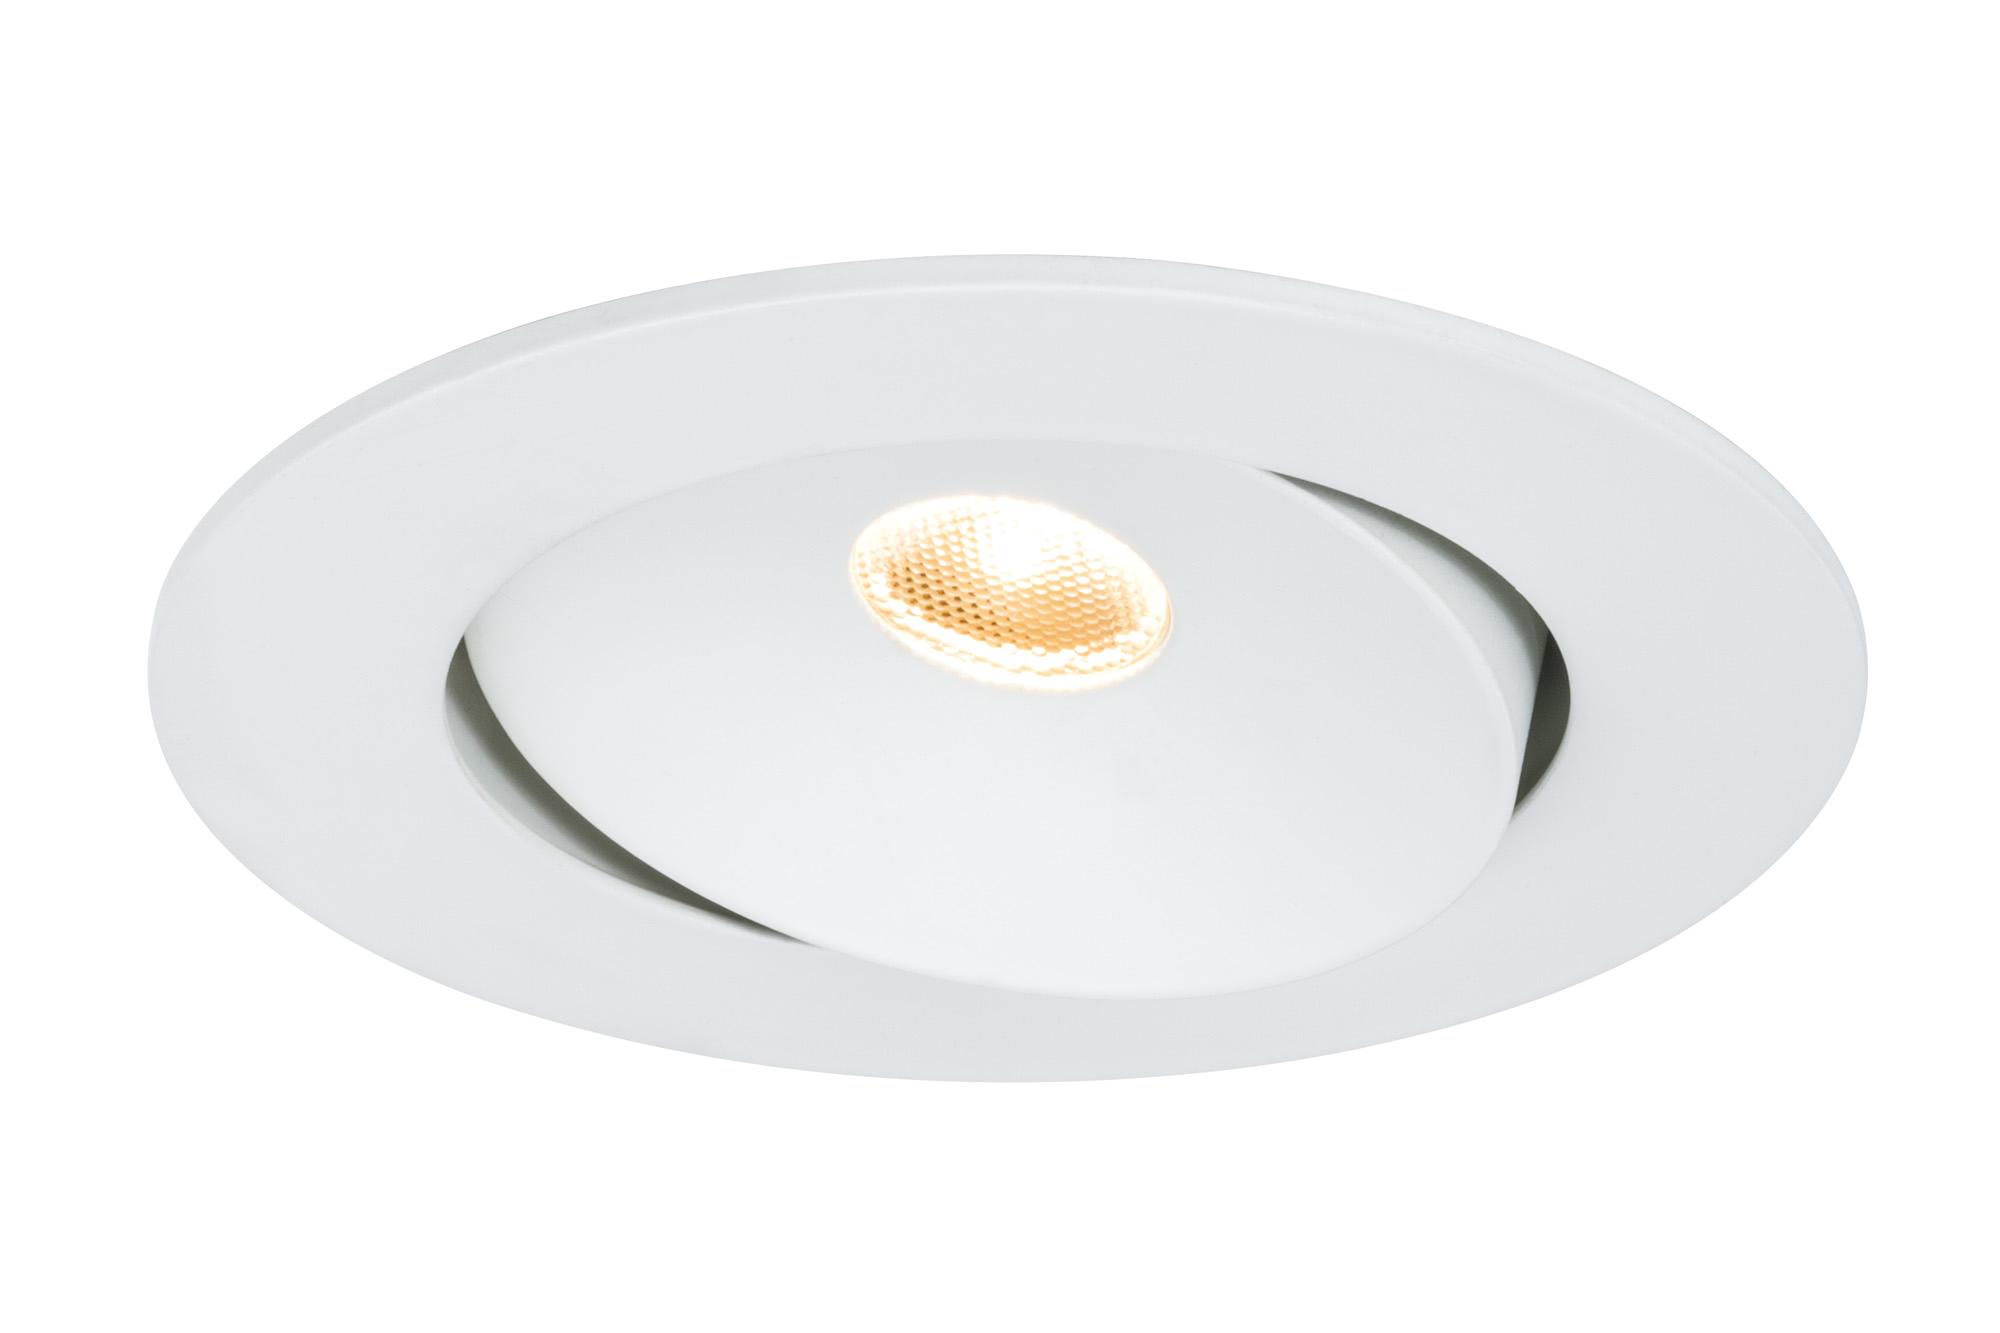 Paulmann. 92687 Светильник встр. комплект Cloud schw LED 3x10W, белый